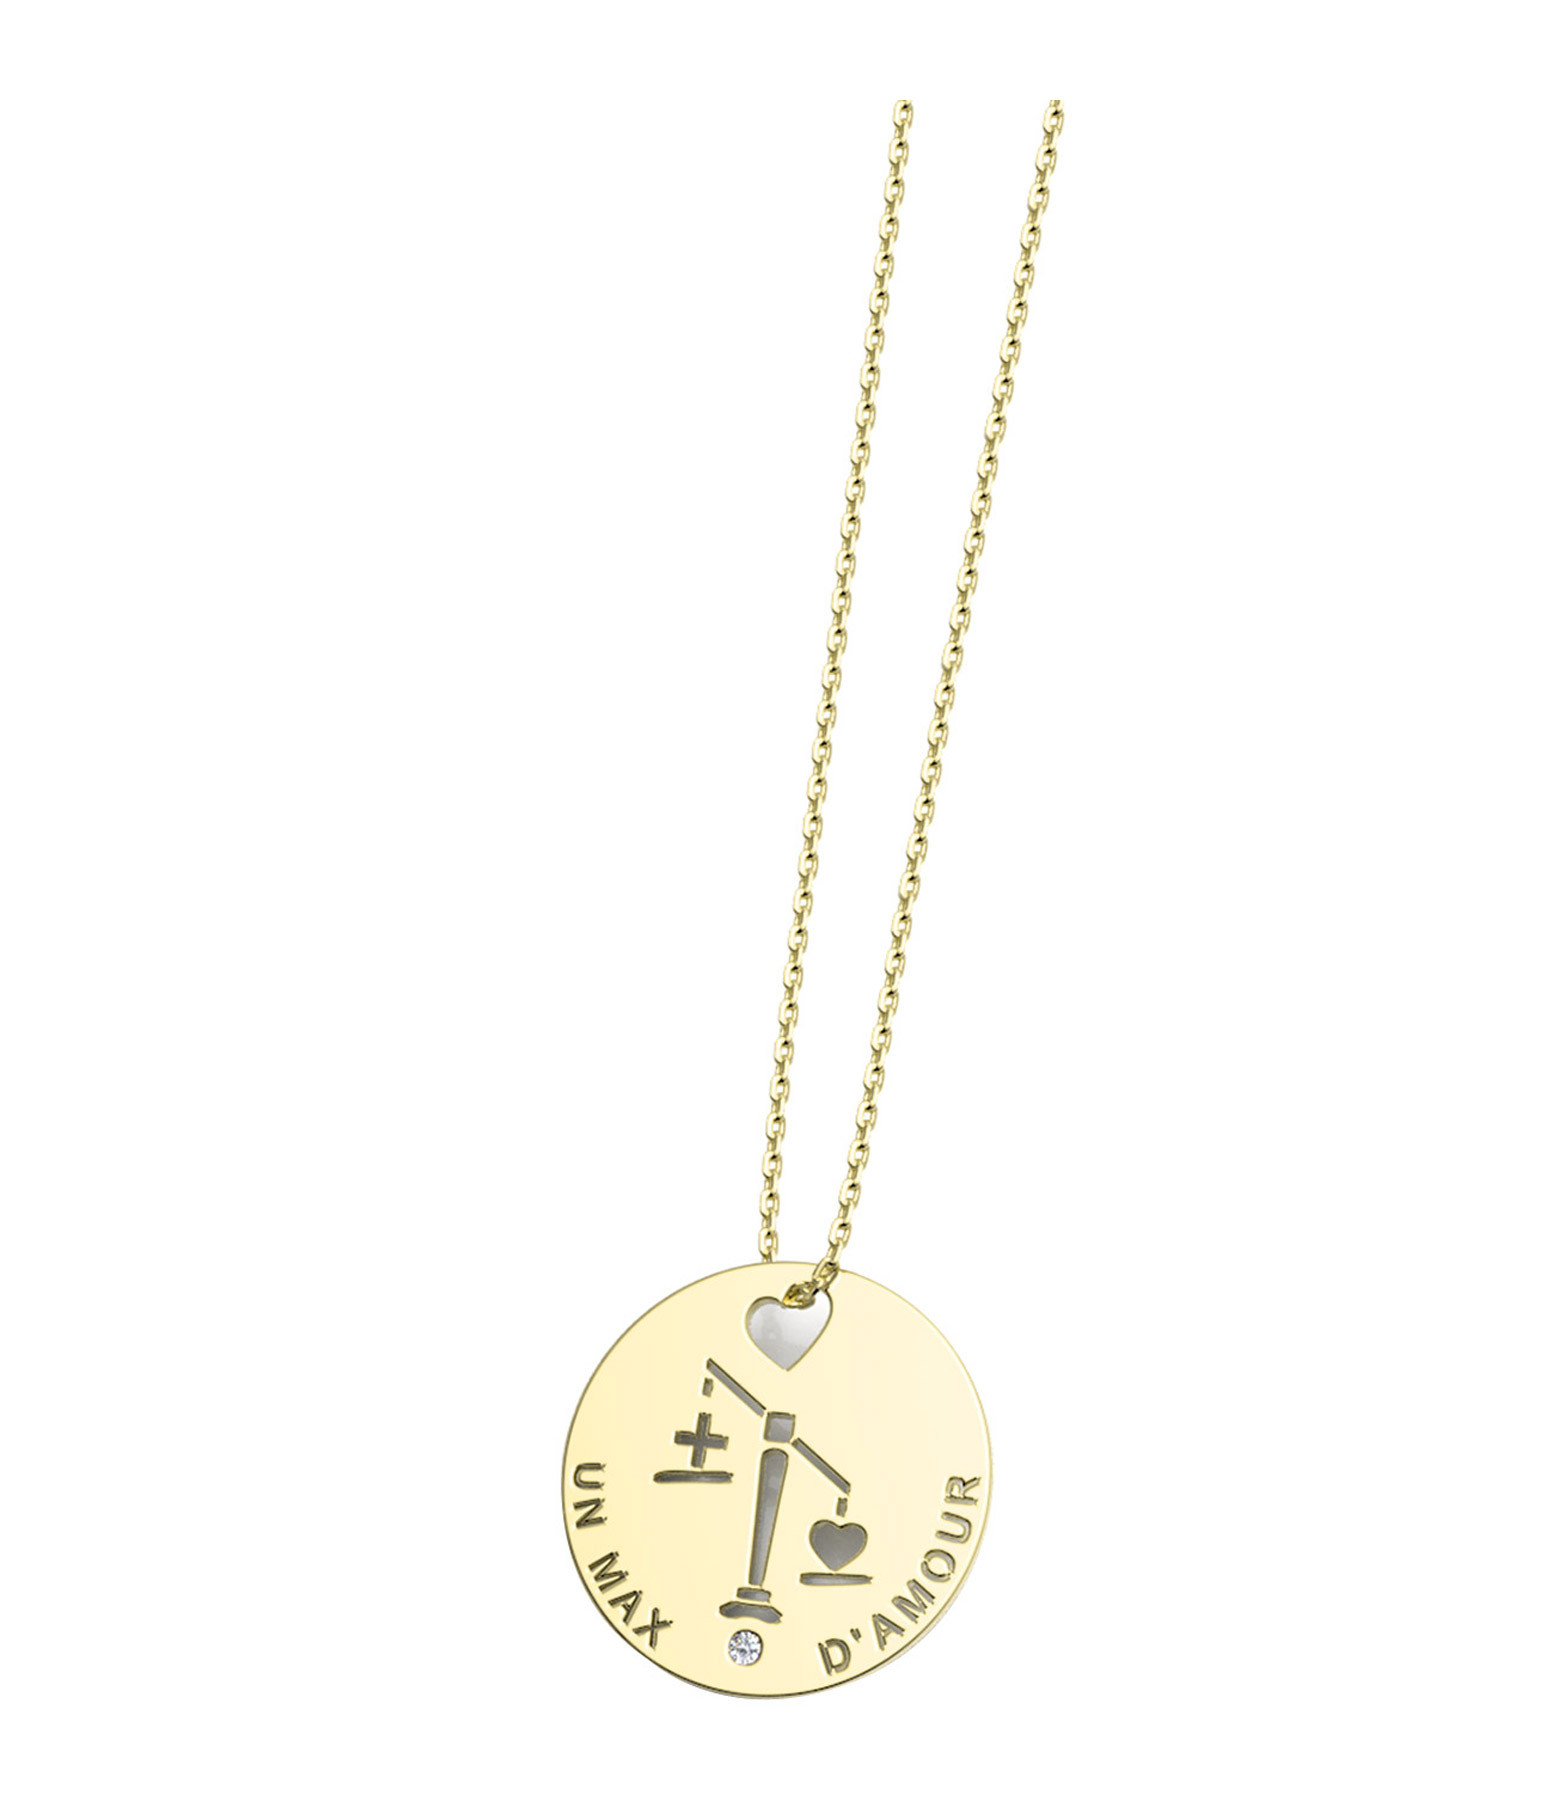 NAVA JOAILLERIE - Collier Horosco-Rock Balance Diamants Or